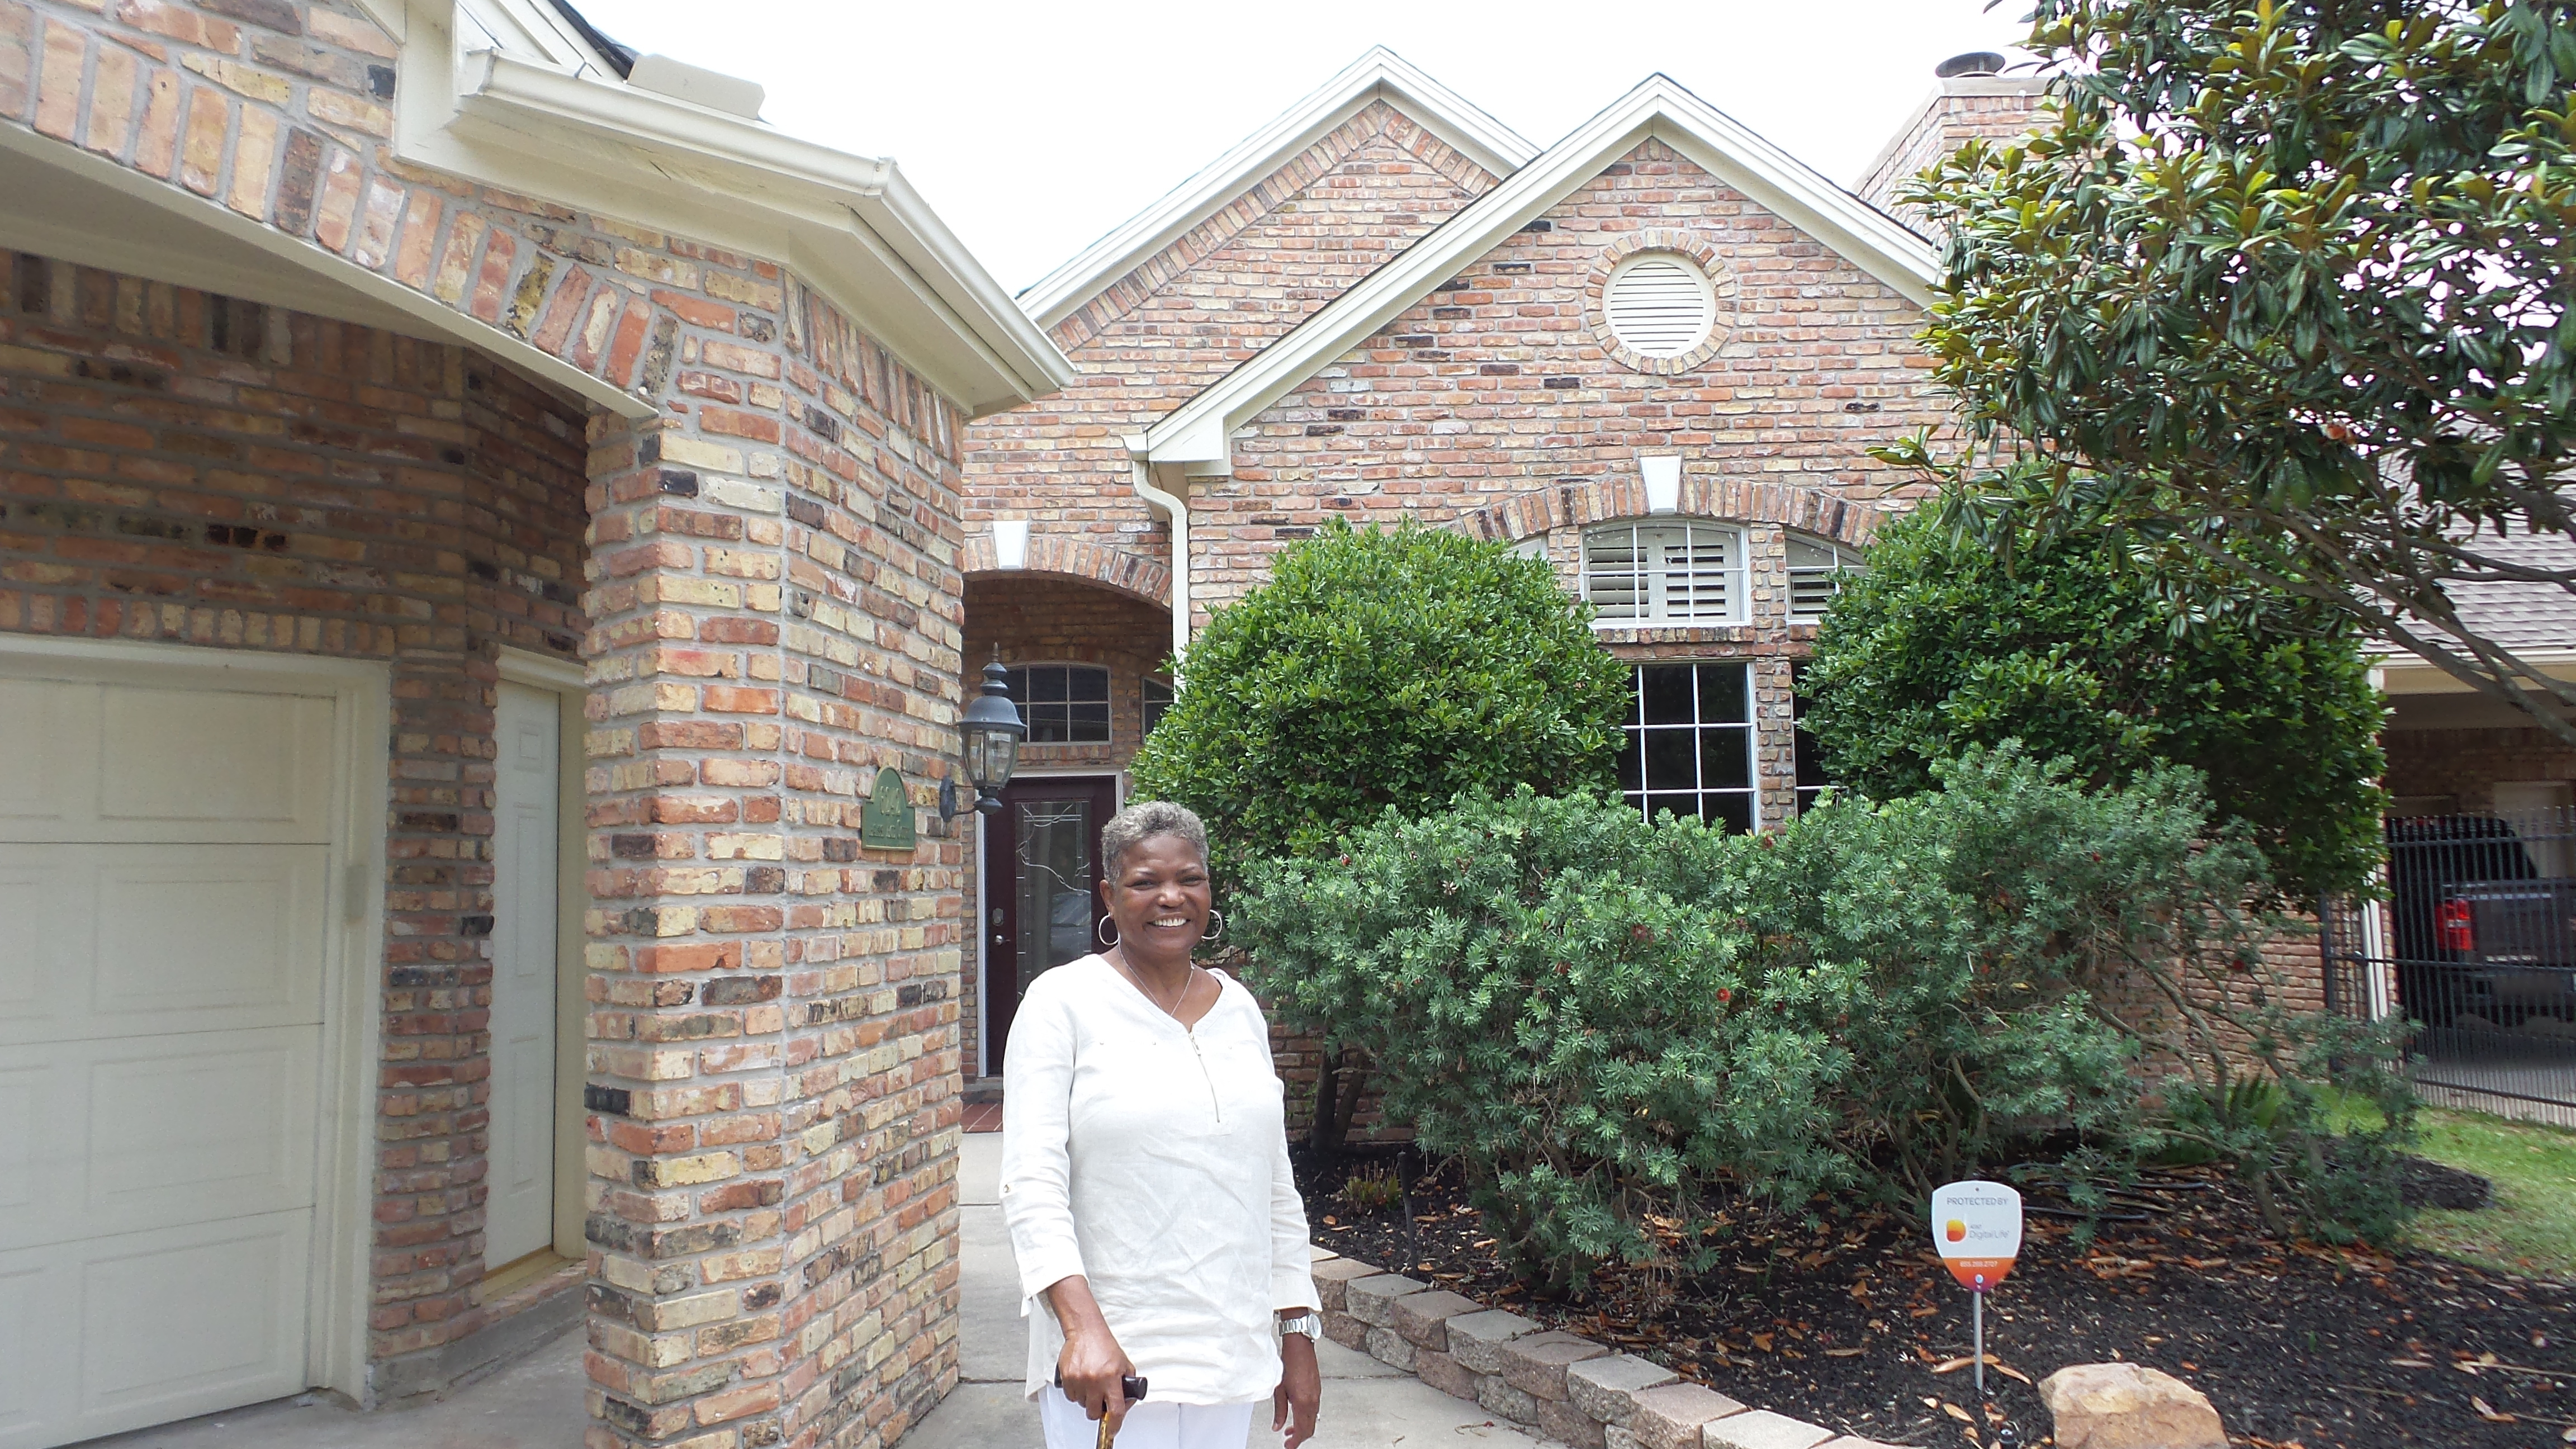 2018.06.11 Linda Jerrols Restoration photos update KP 11.jpg